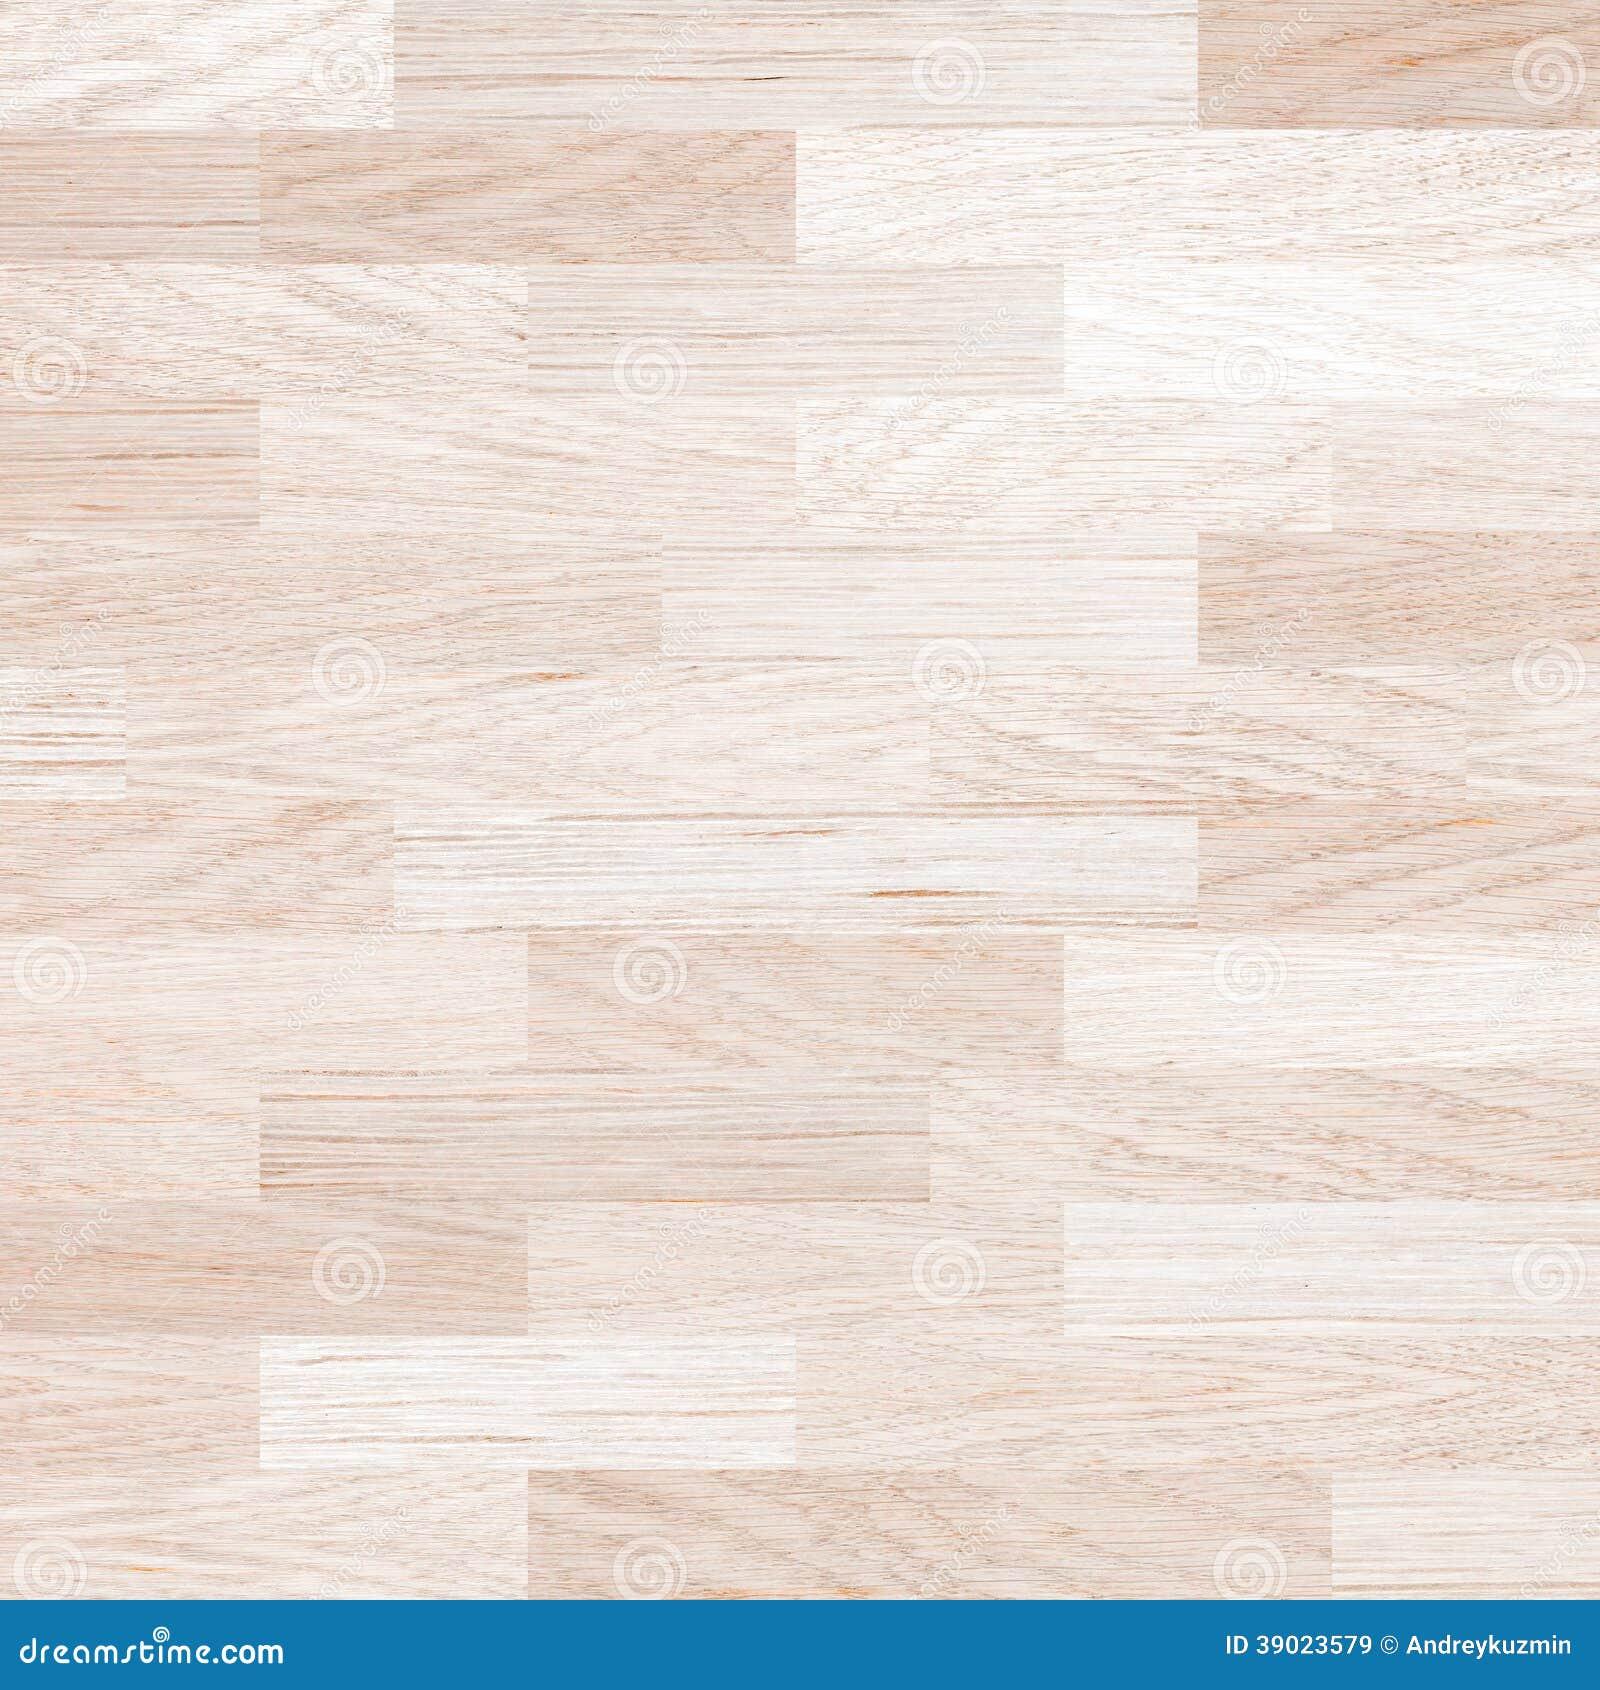 wooden floor parquet background stock image image 39023579